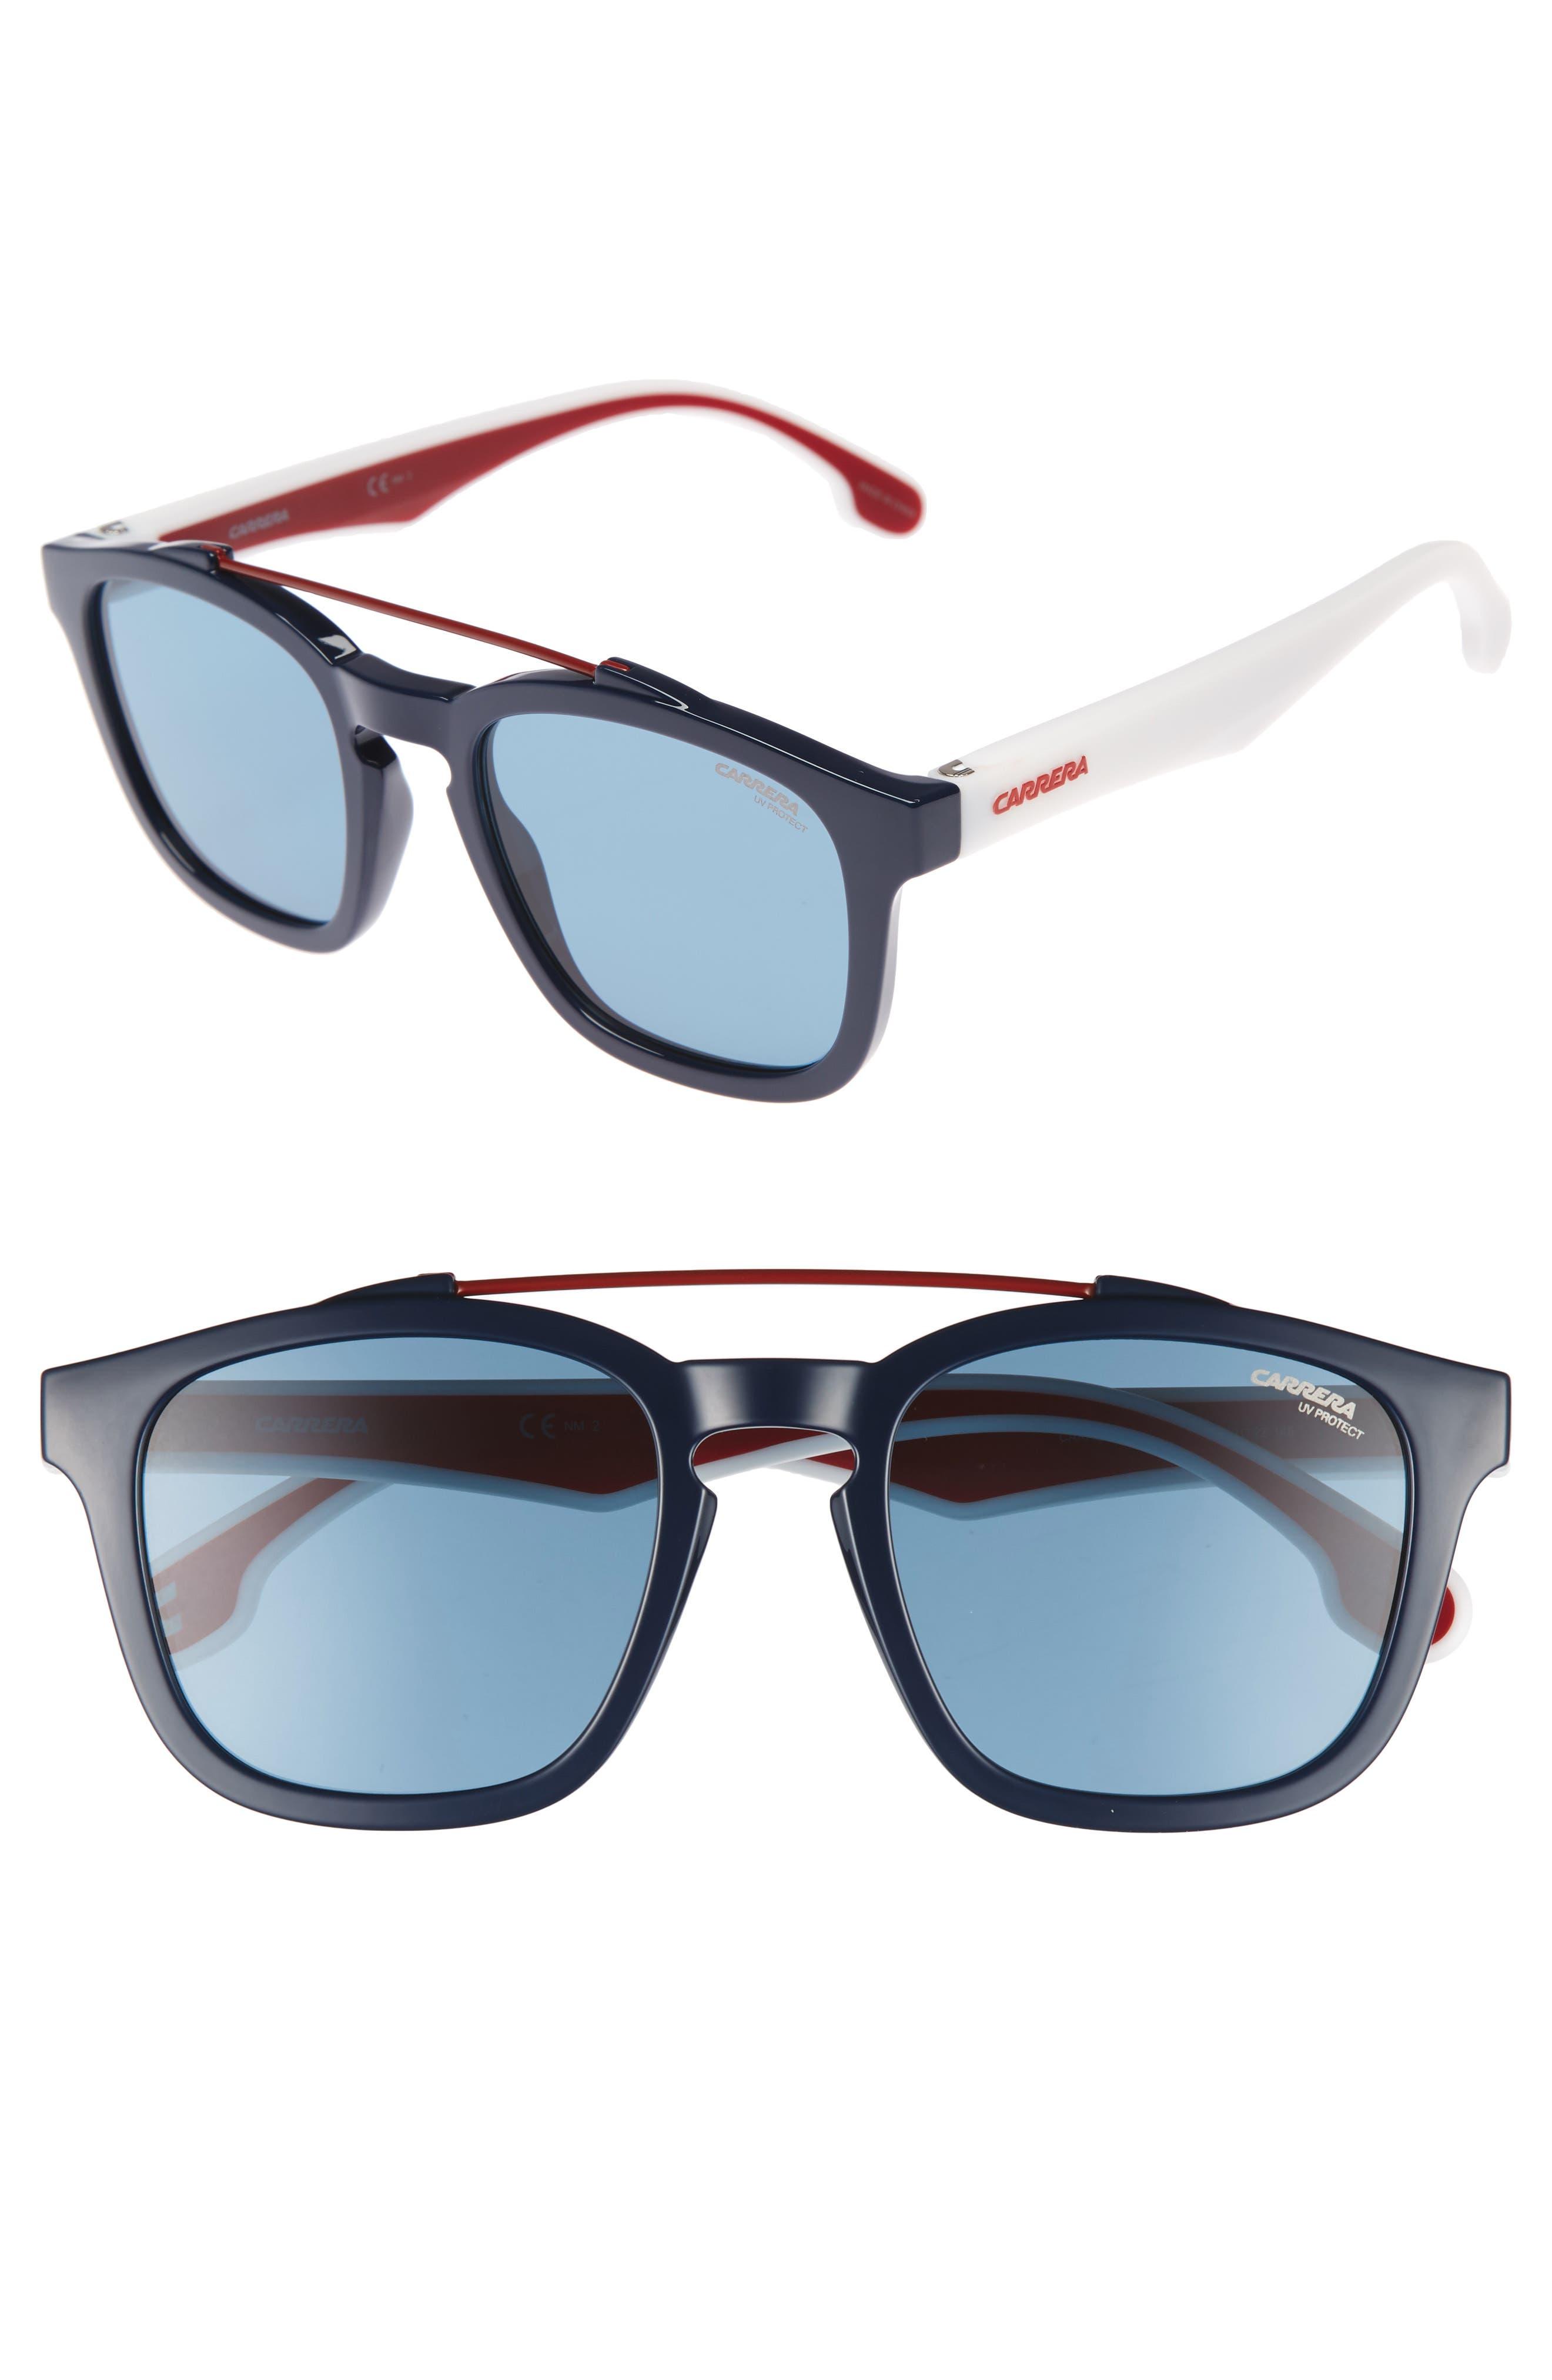 Alternate Image 1 Selected - Carrera Eyewear 1011S Sunglasses